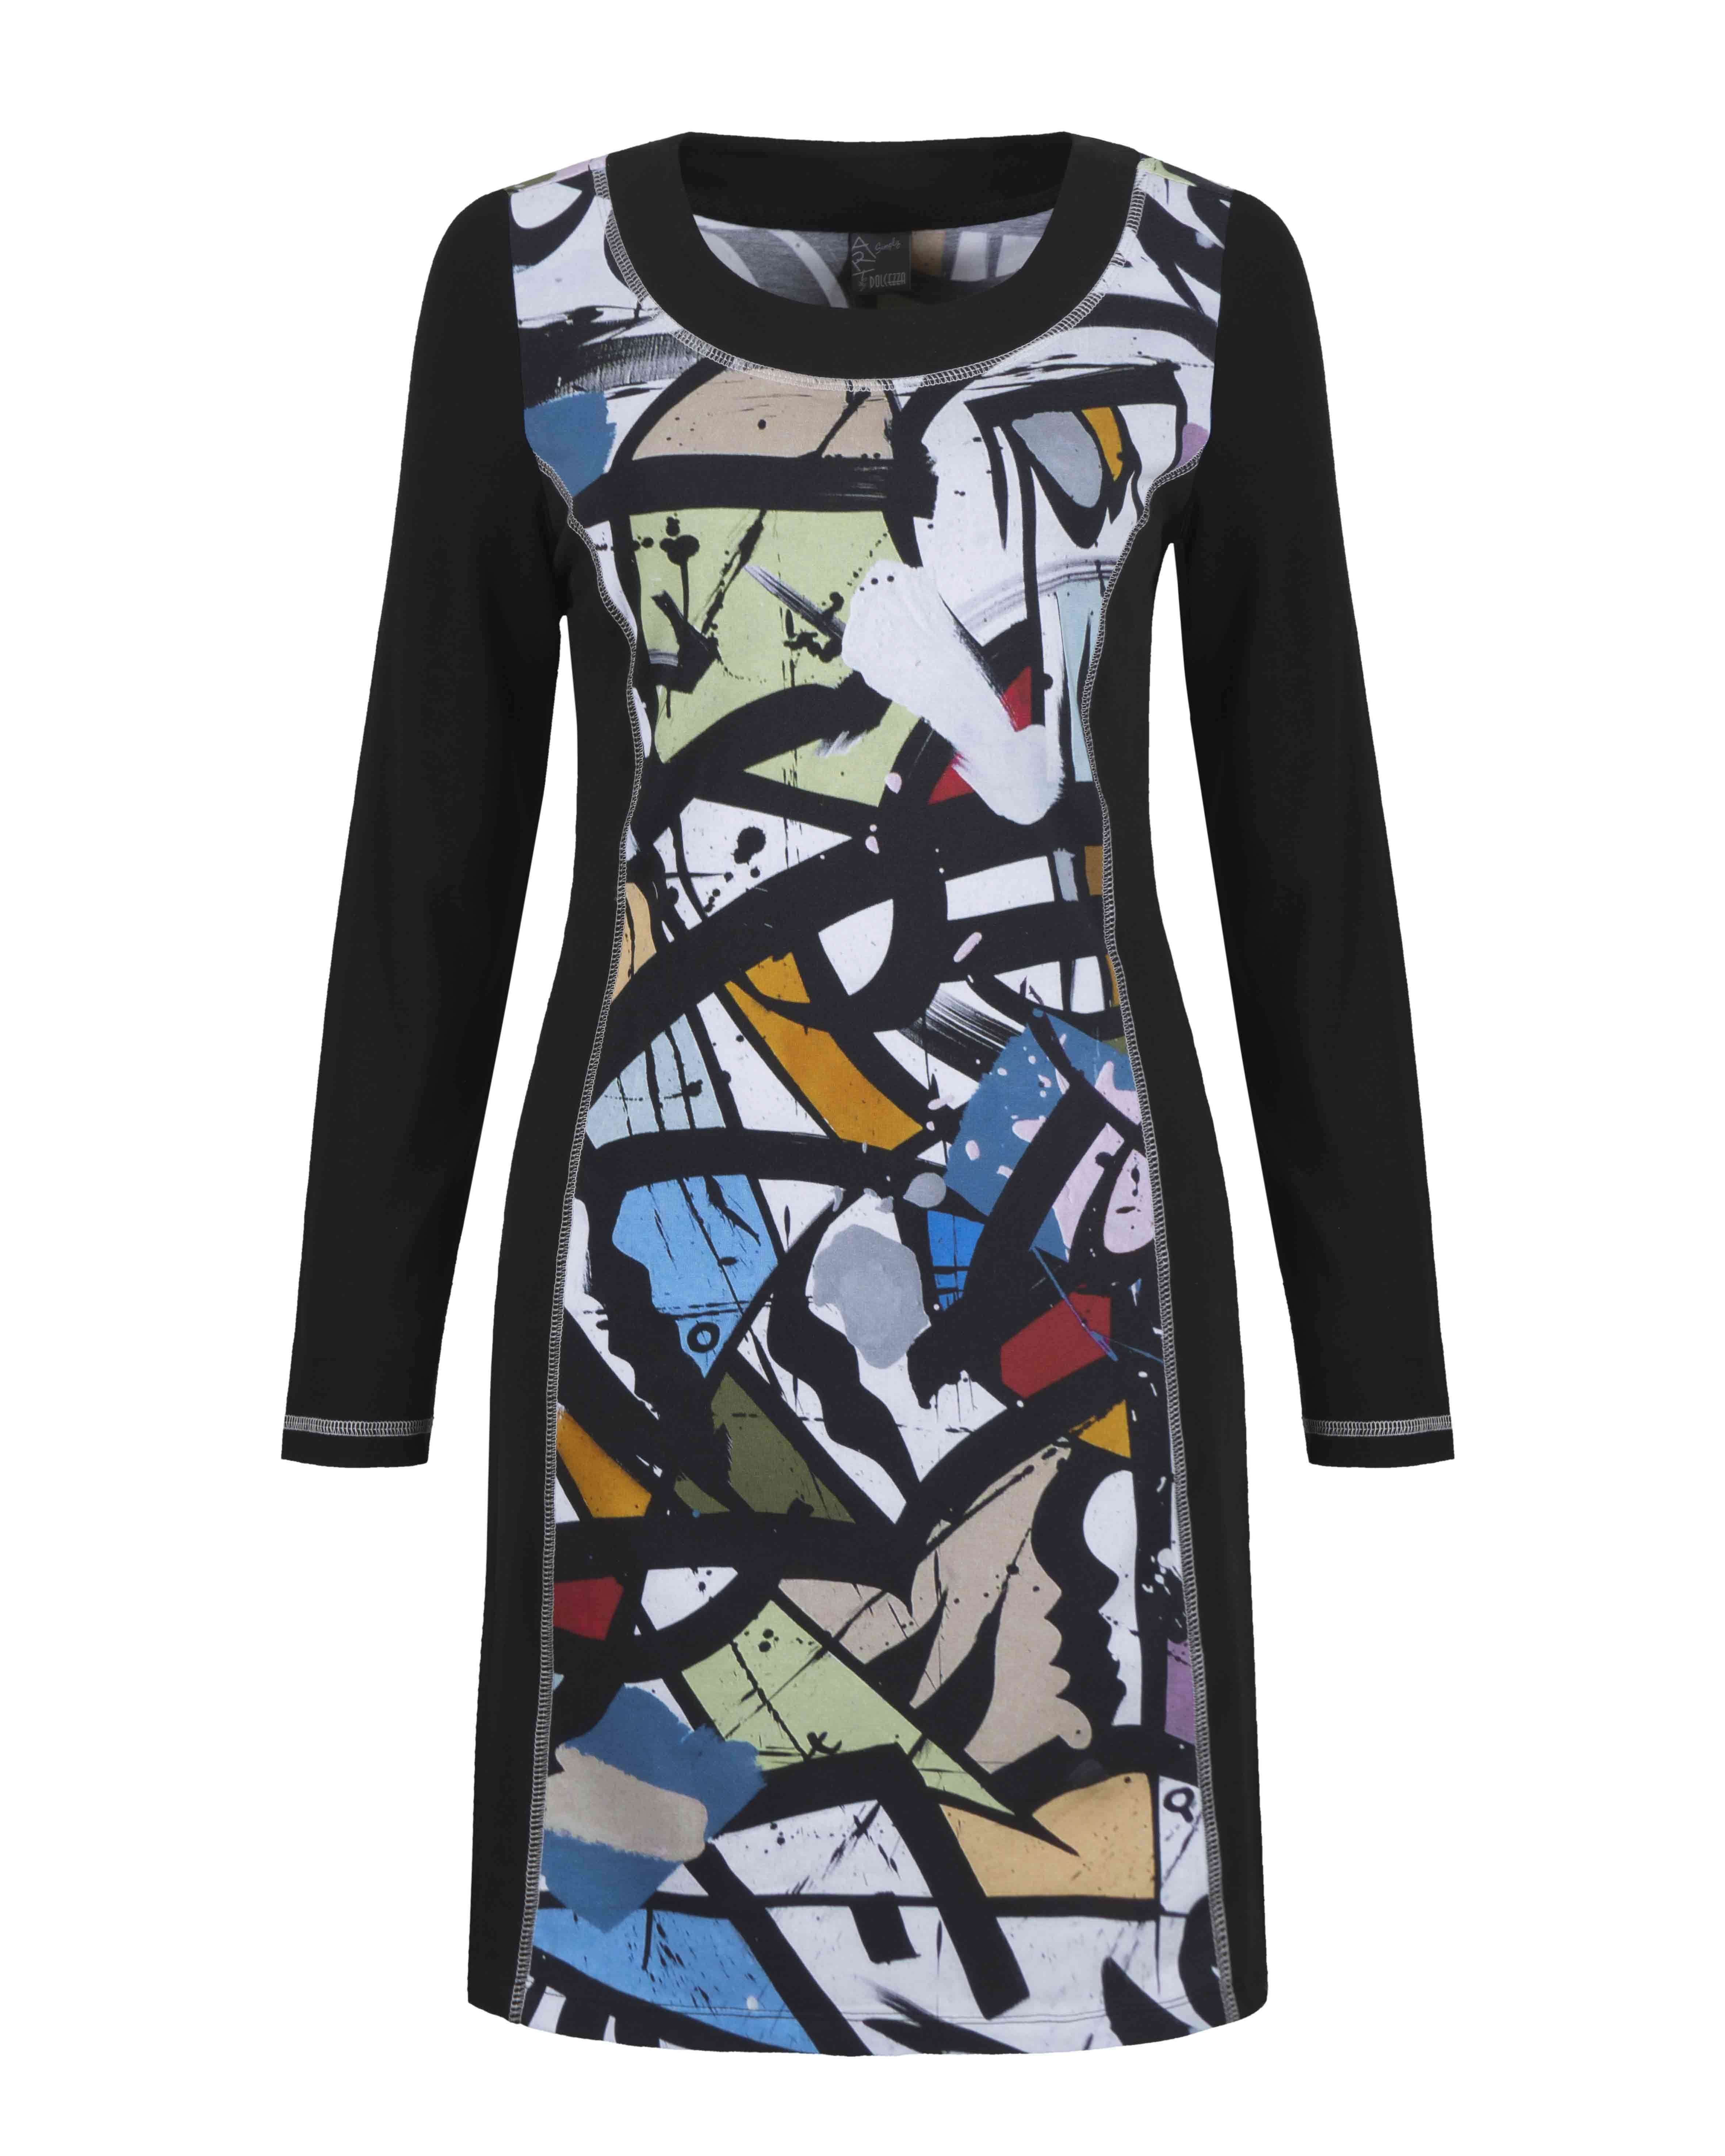 Simply Art Dolcezza: Gorgeous Graffiti Art Cotton Knit Dress/Tunic SOLD OUT